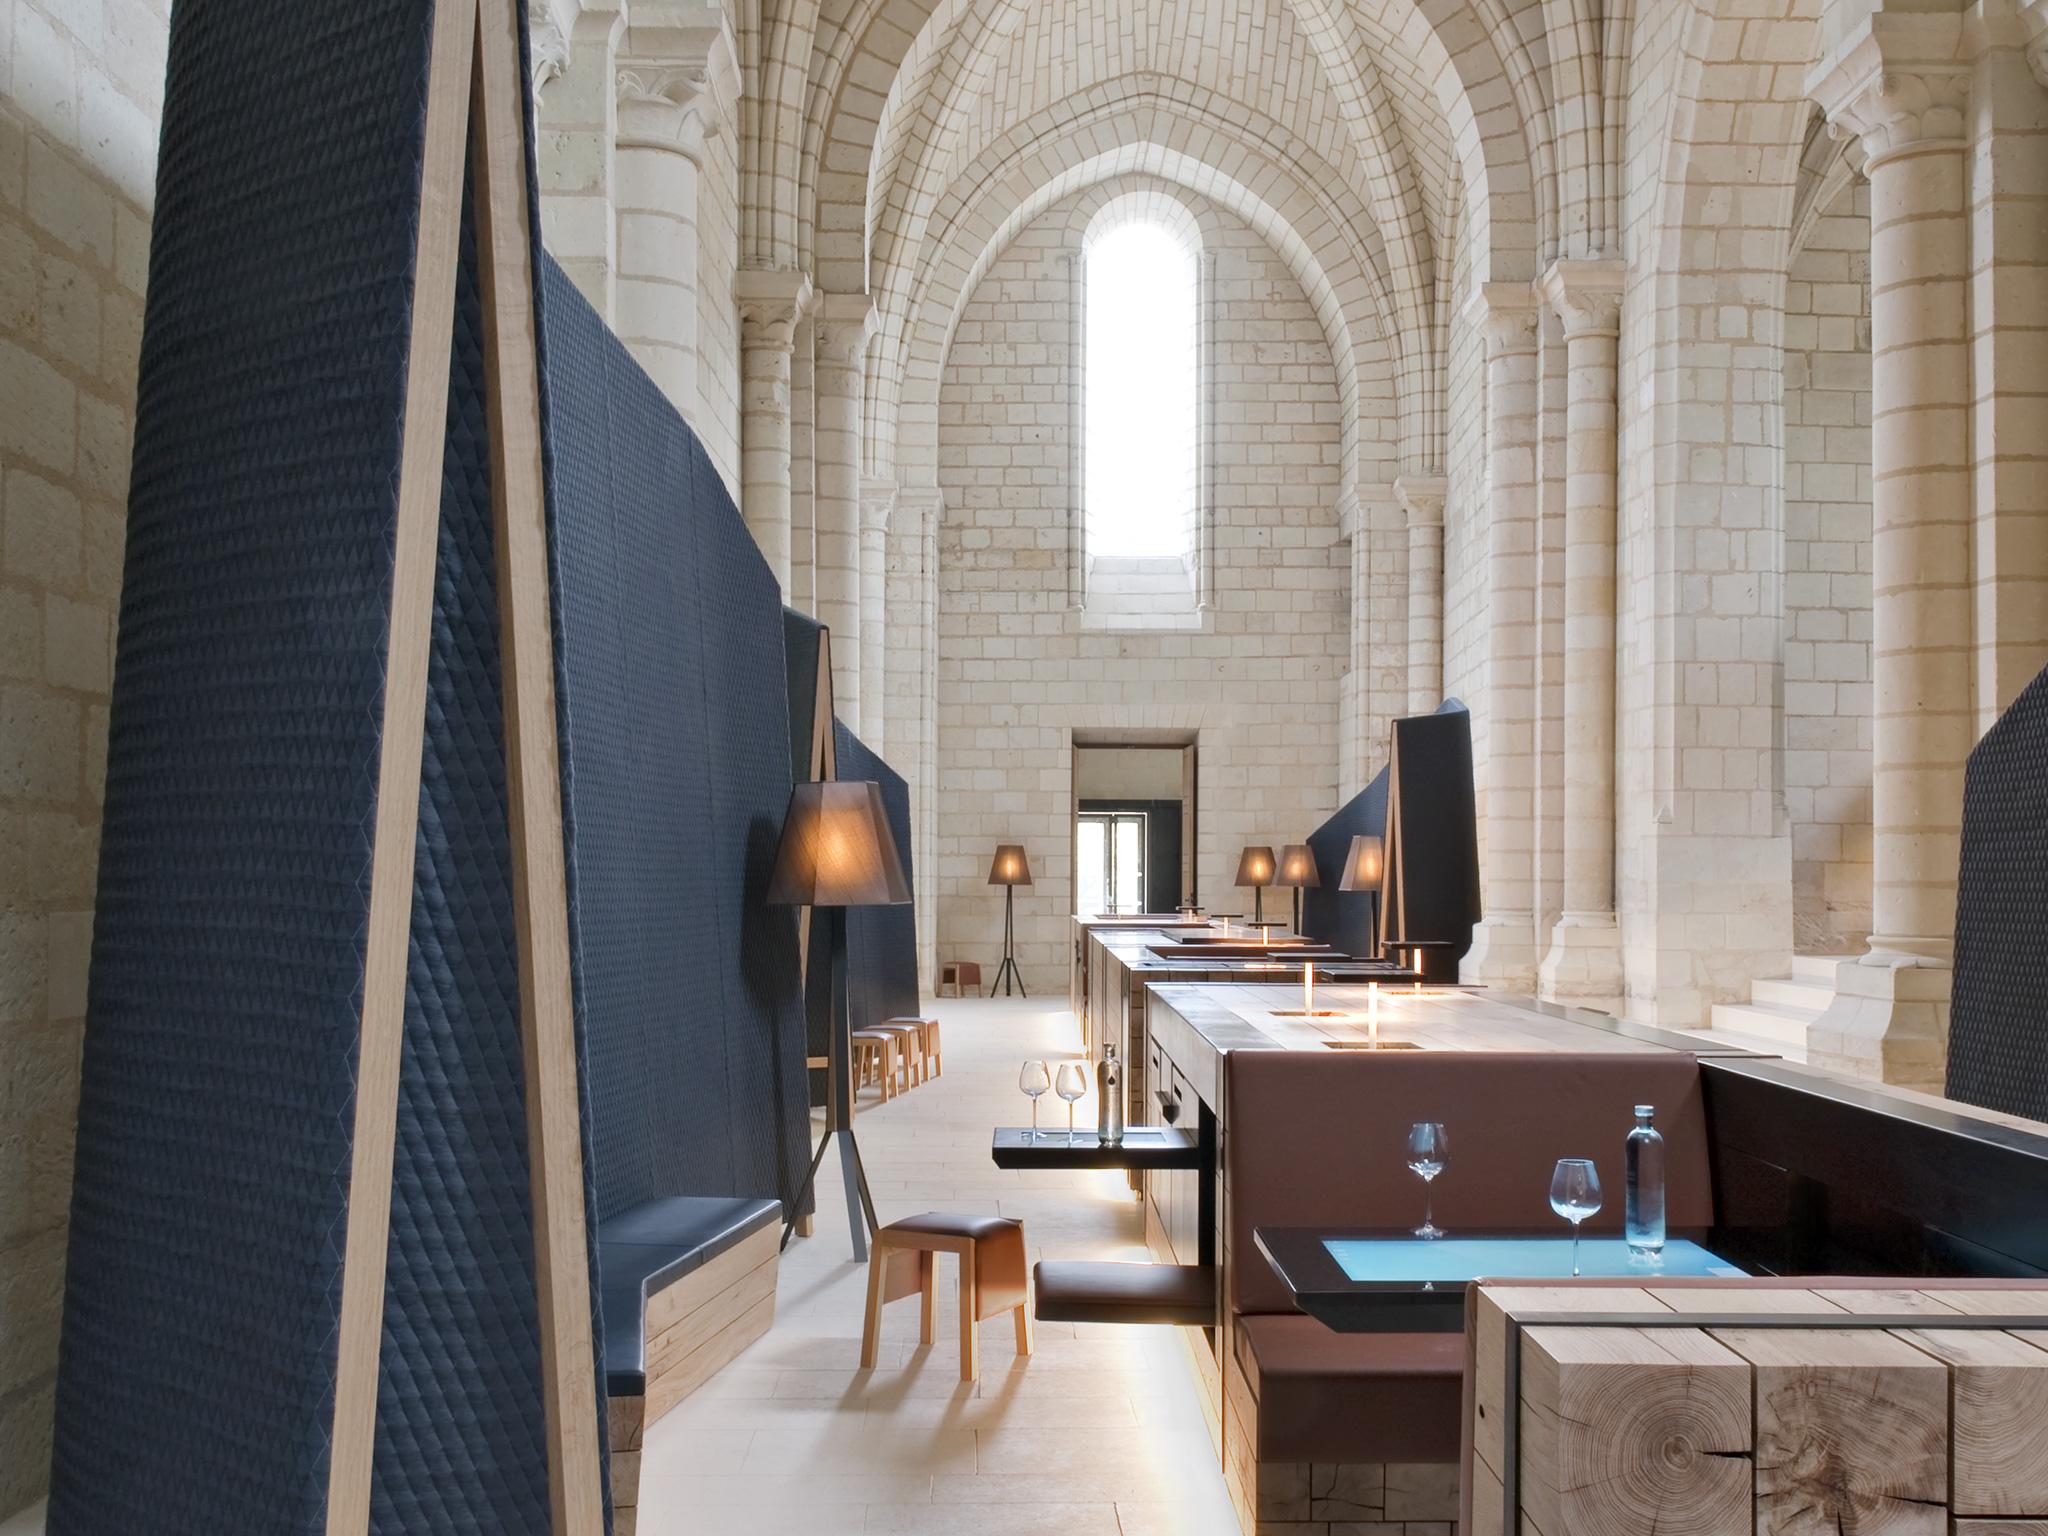 hébergement insolite : dormir dans l'abbaye hôtel de Fontevraud